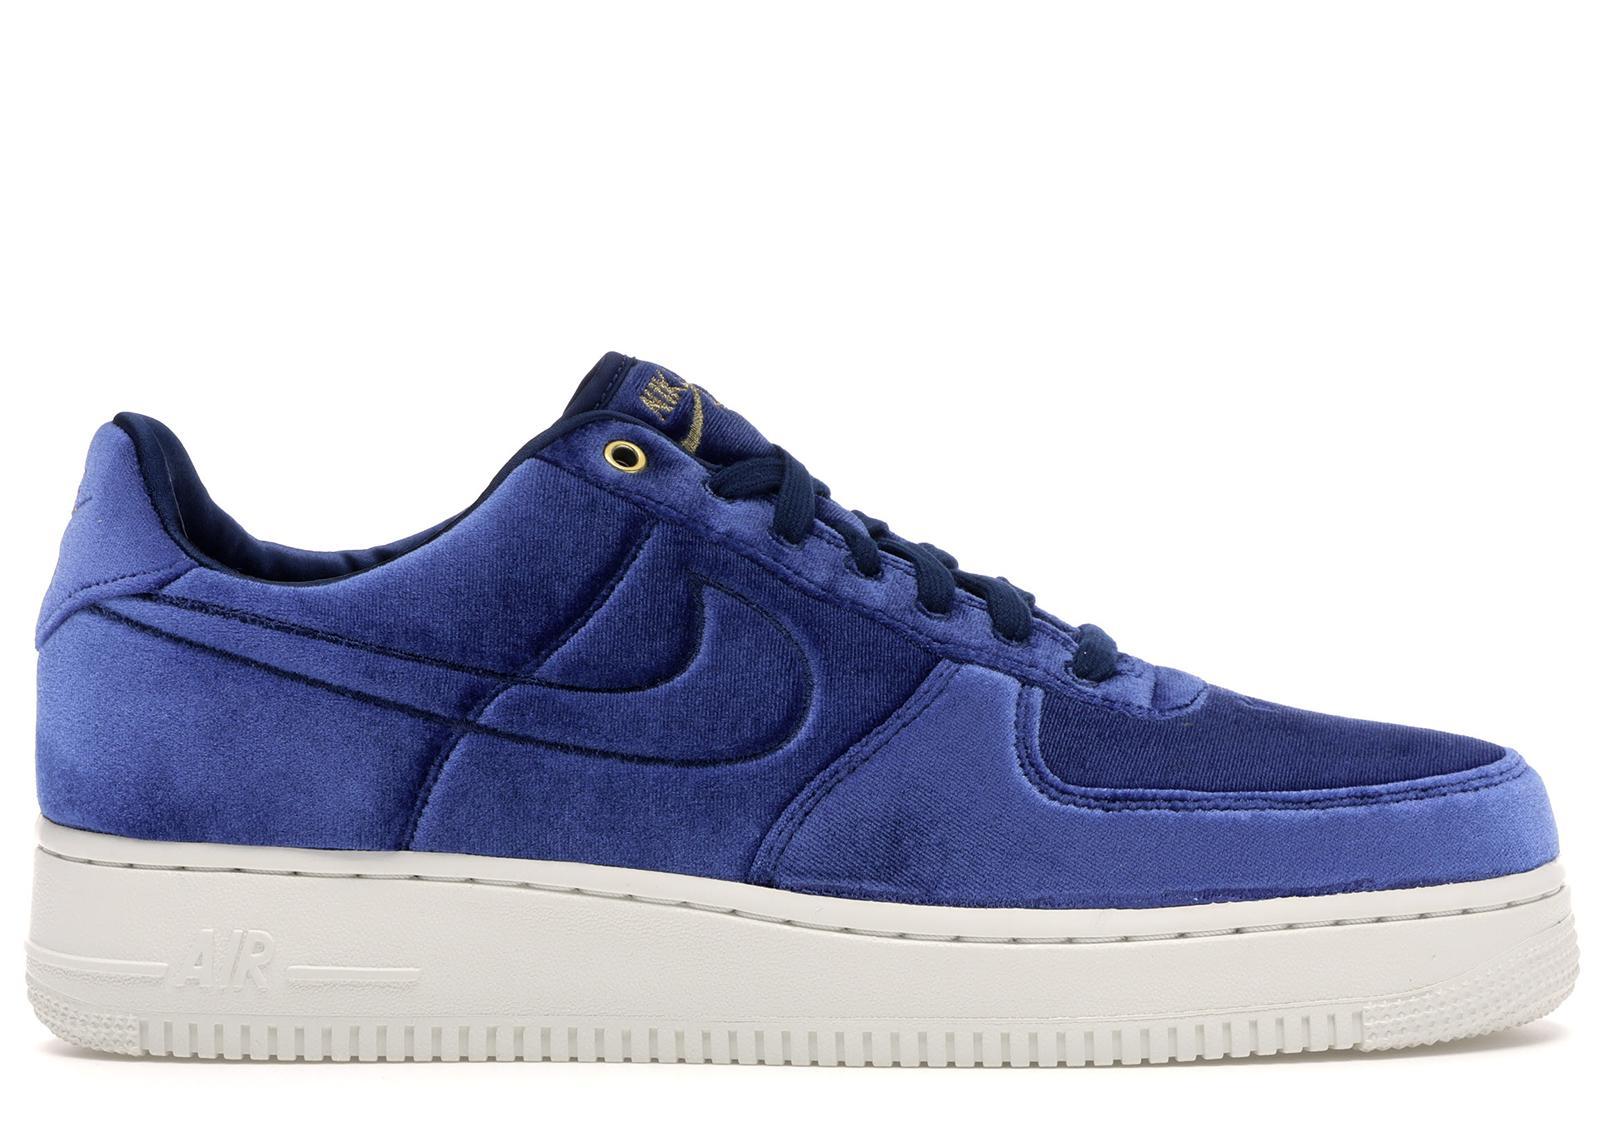 Nike Air Force 1 Low Premium 3 Velour Blue Void for Men - Lyst